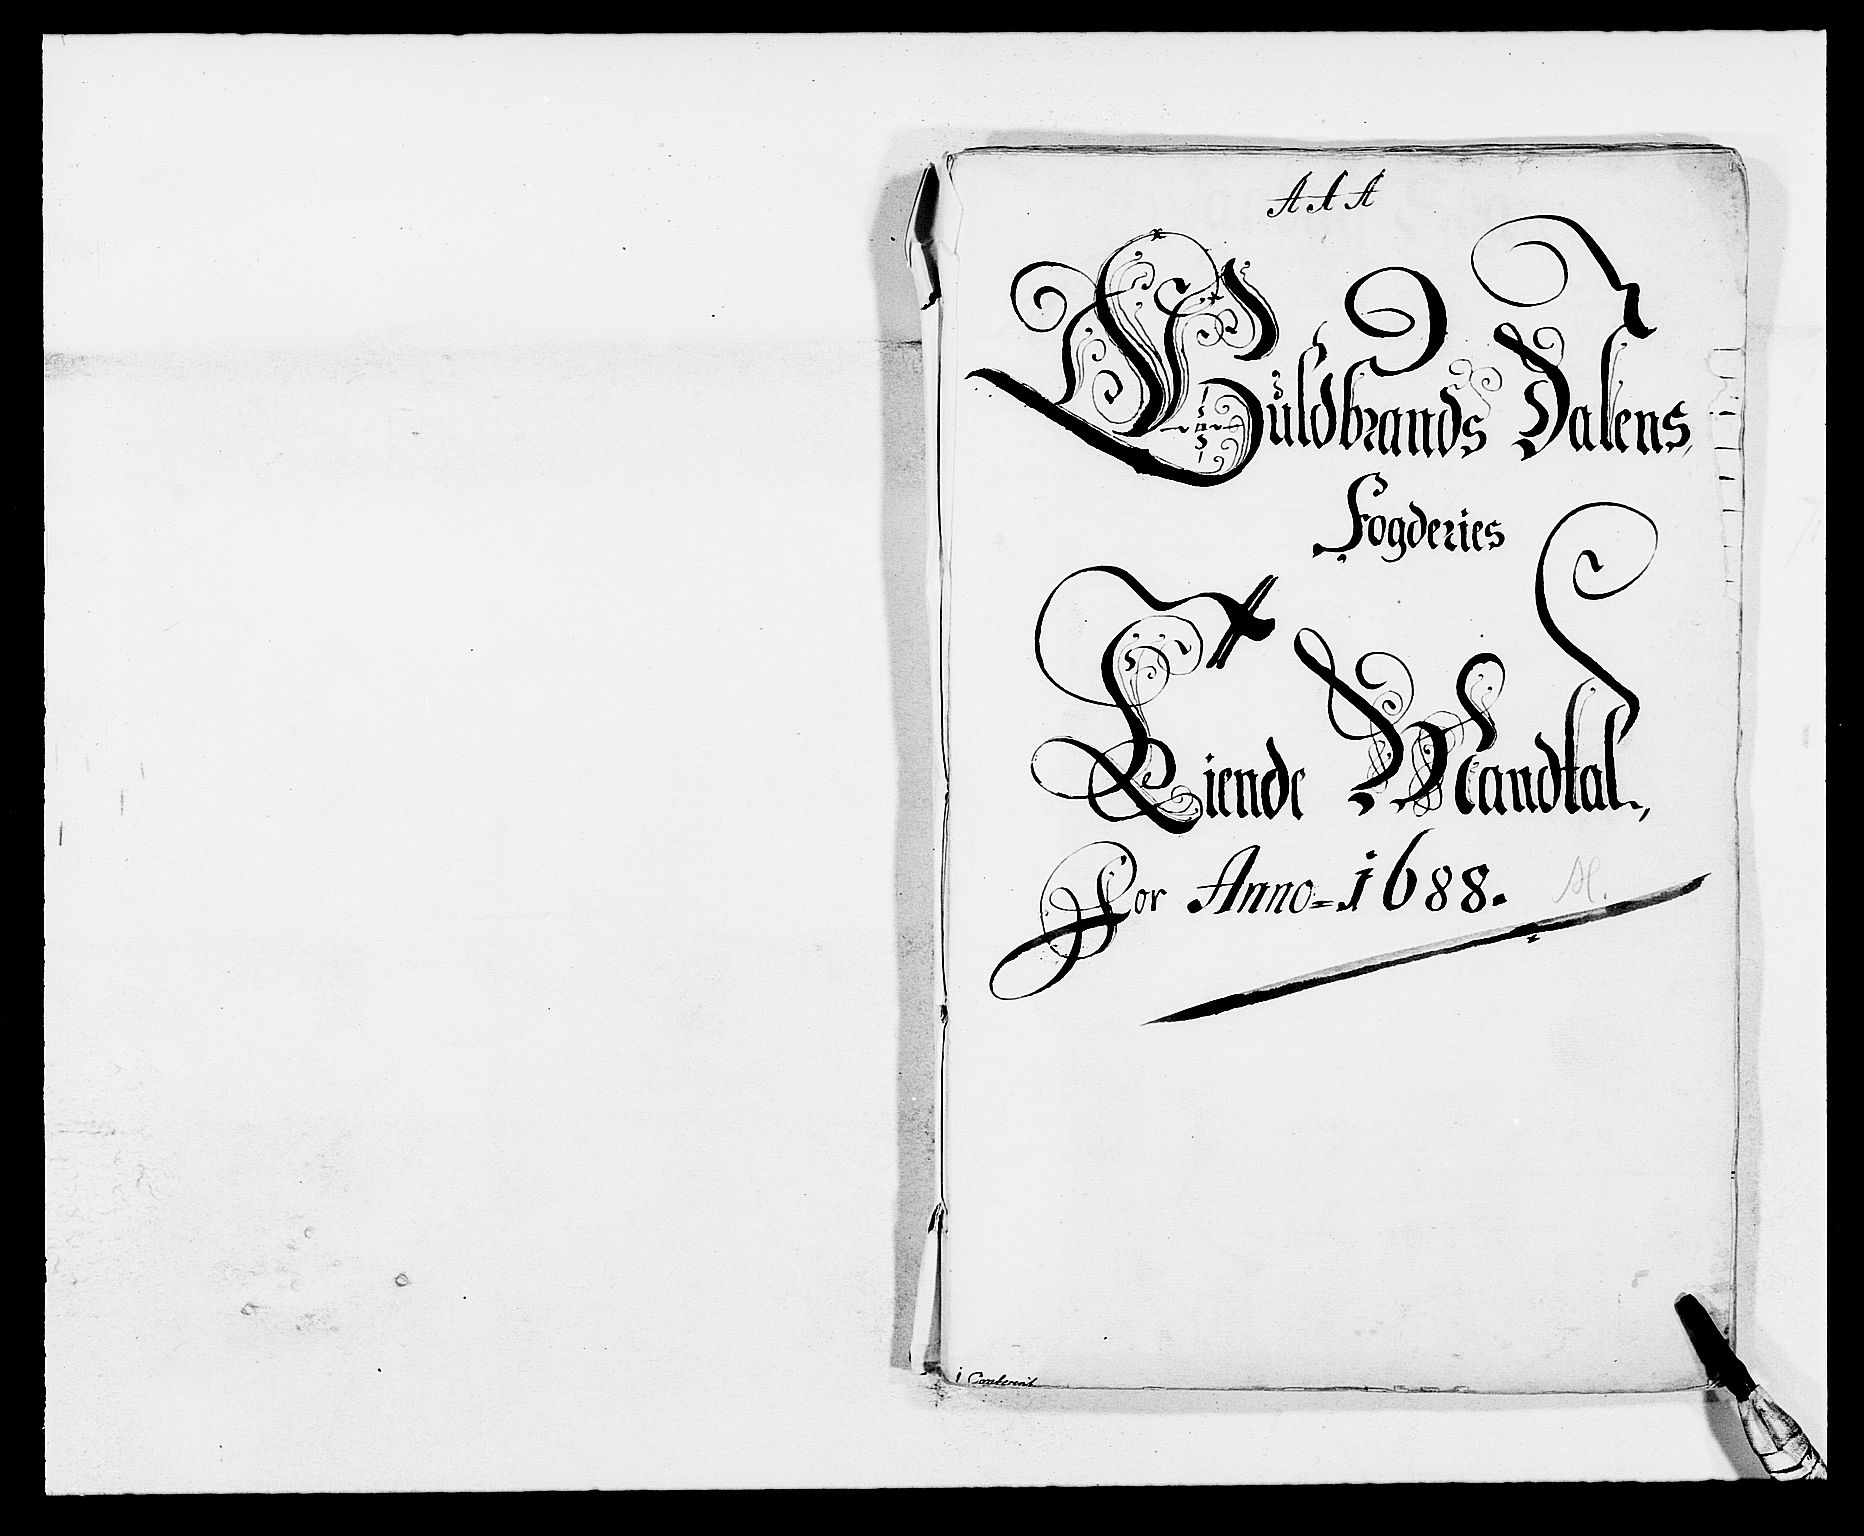 RA, Rentekammeret inntil 1814, Reviderte regnskaper, Fogderegnskap, R17/L1163: Fogderegnskap Gudbrandsdal, 1682-1689, s. 22